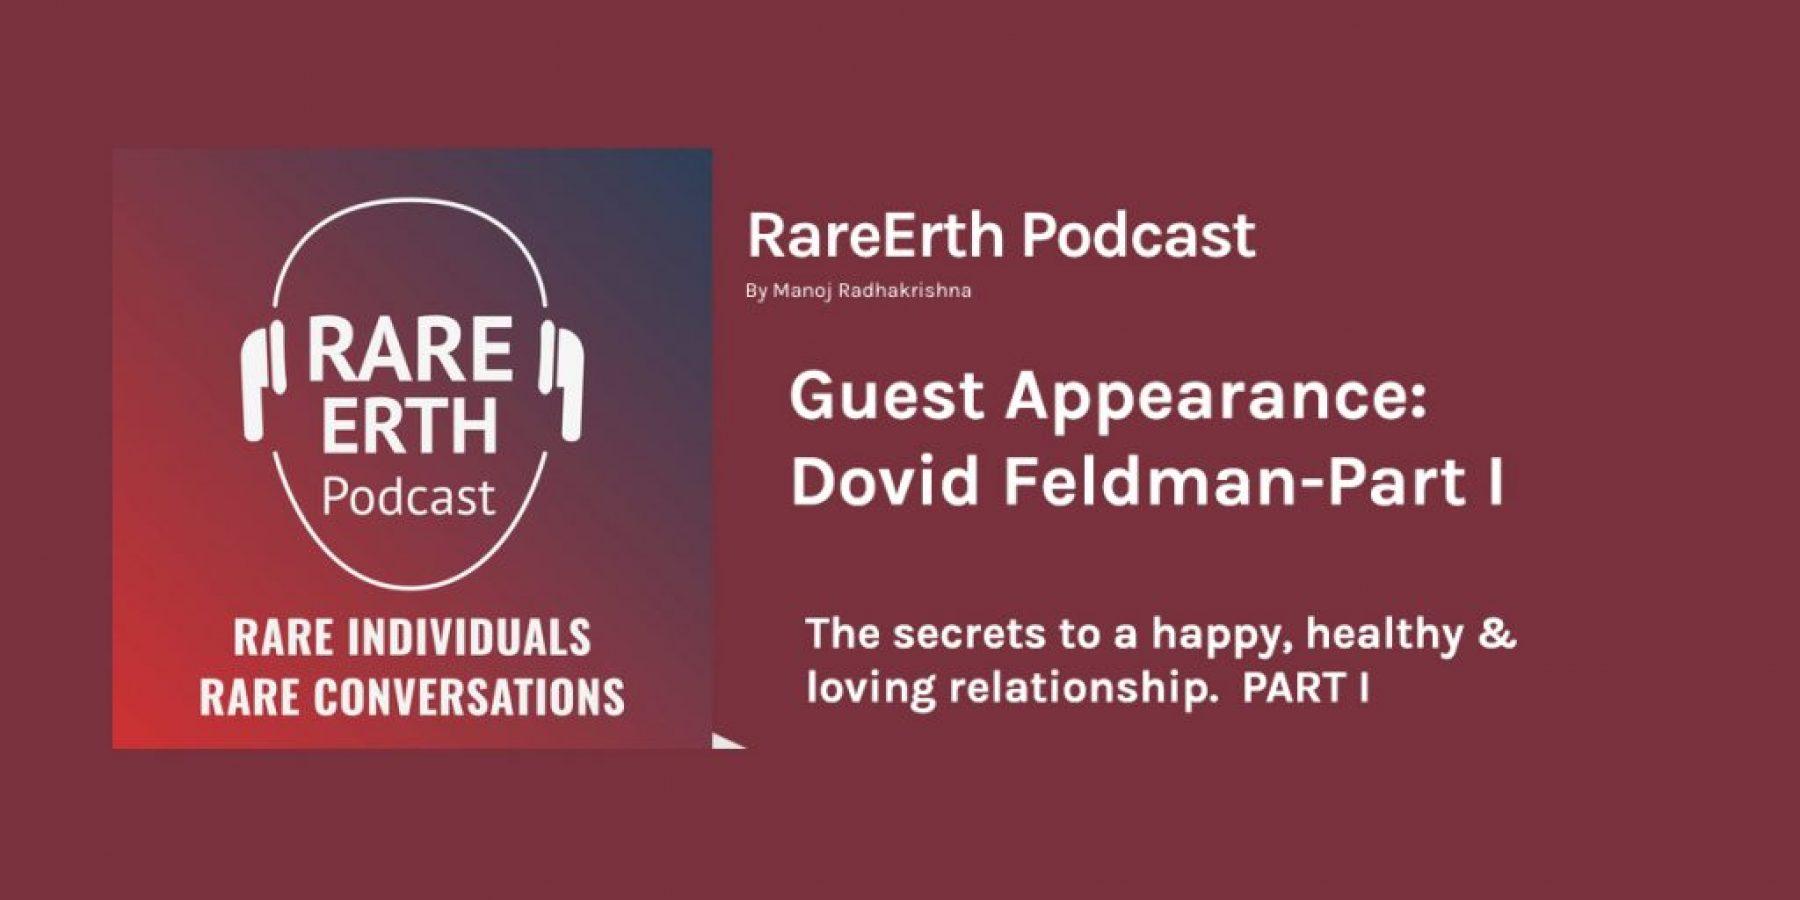 RarErth_Podcast_Part_1